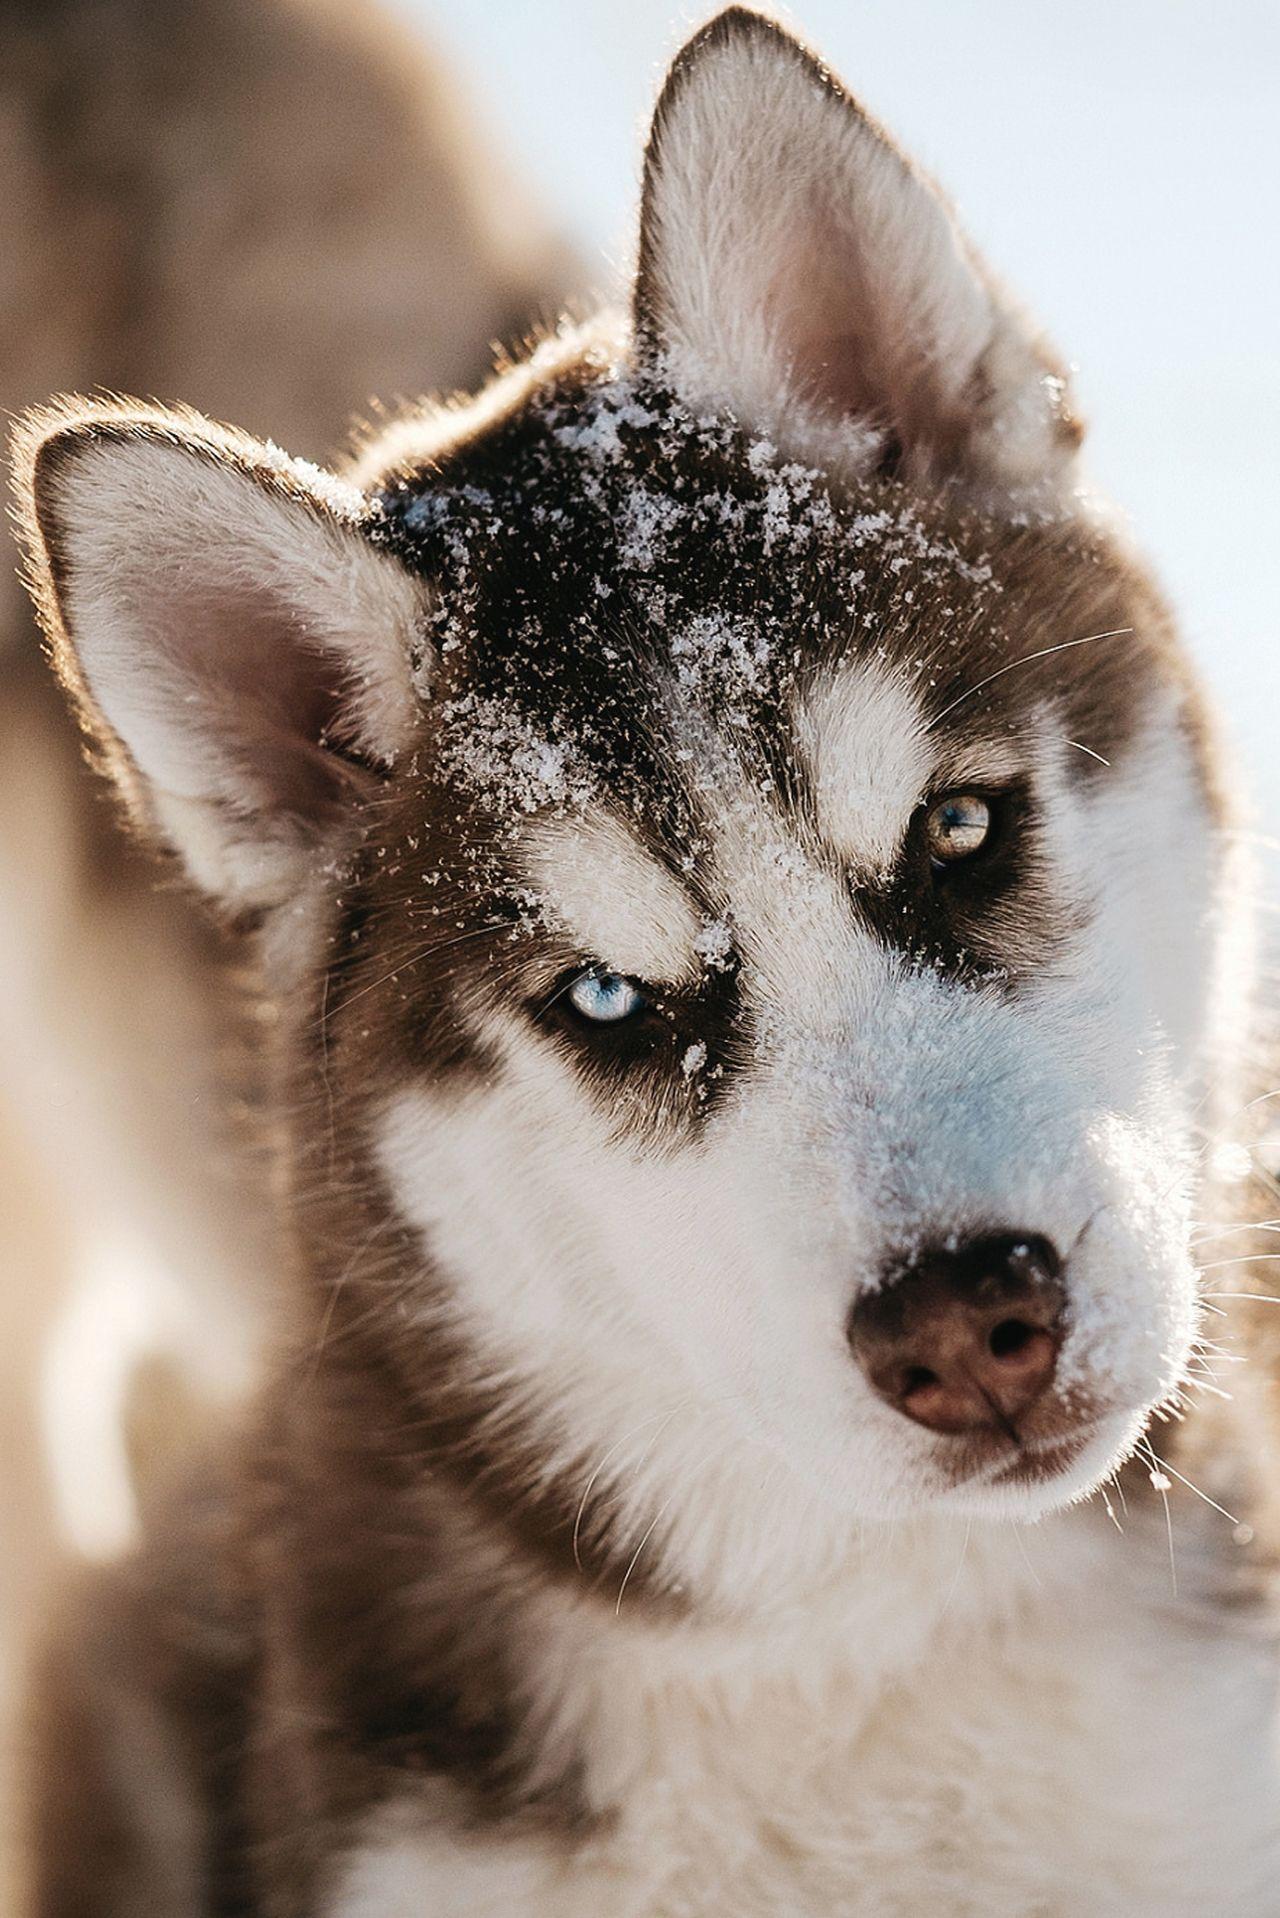 souhailbog: Husky Puppy in Snow | © Jesse James